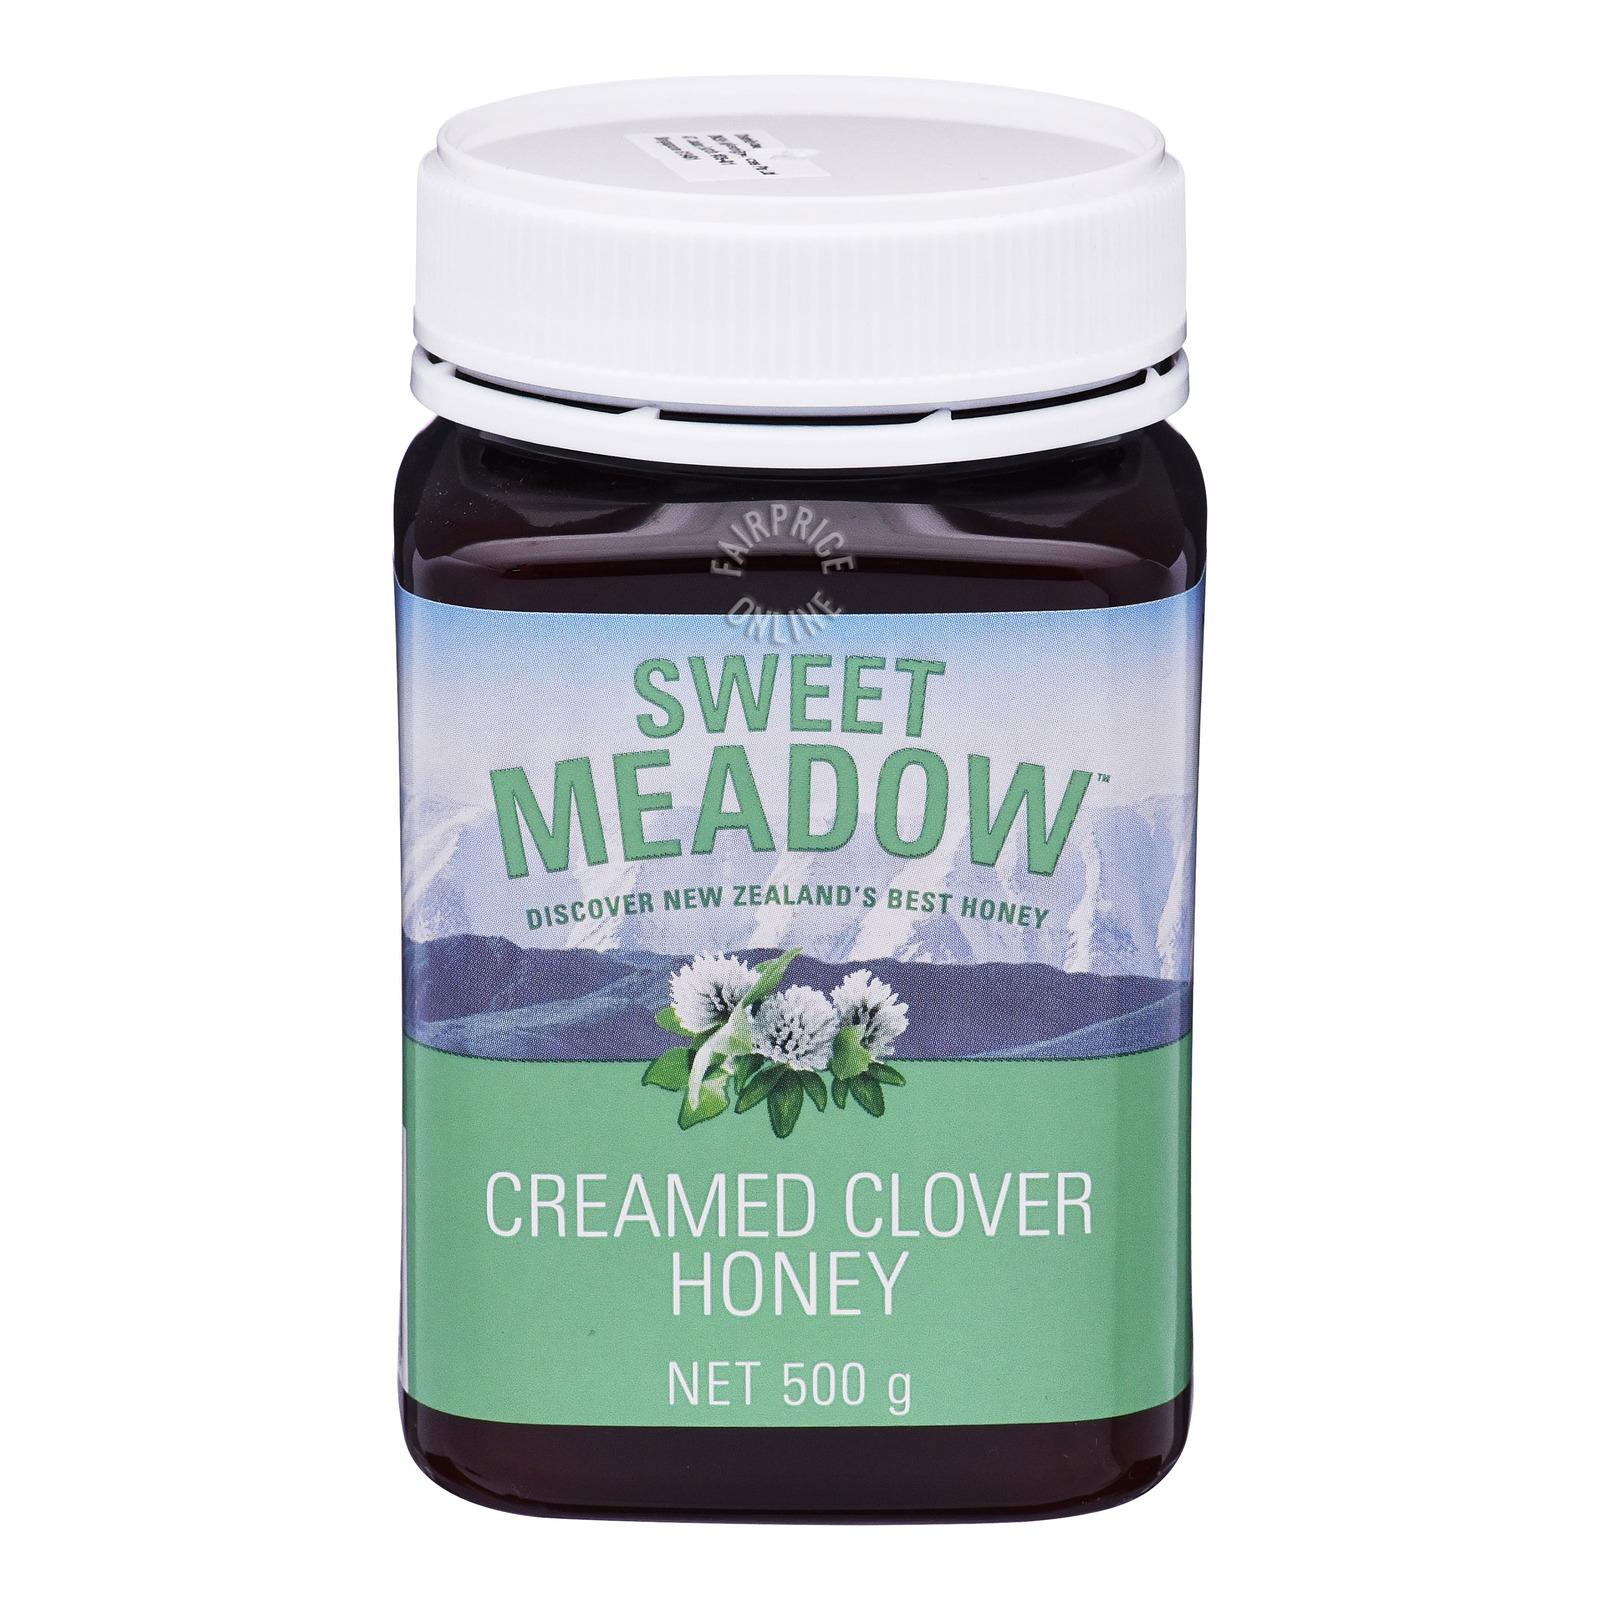 Sweet Meadow Creamed Clover Honey